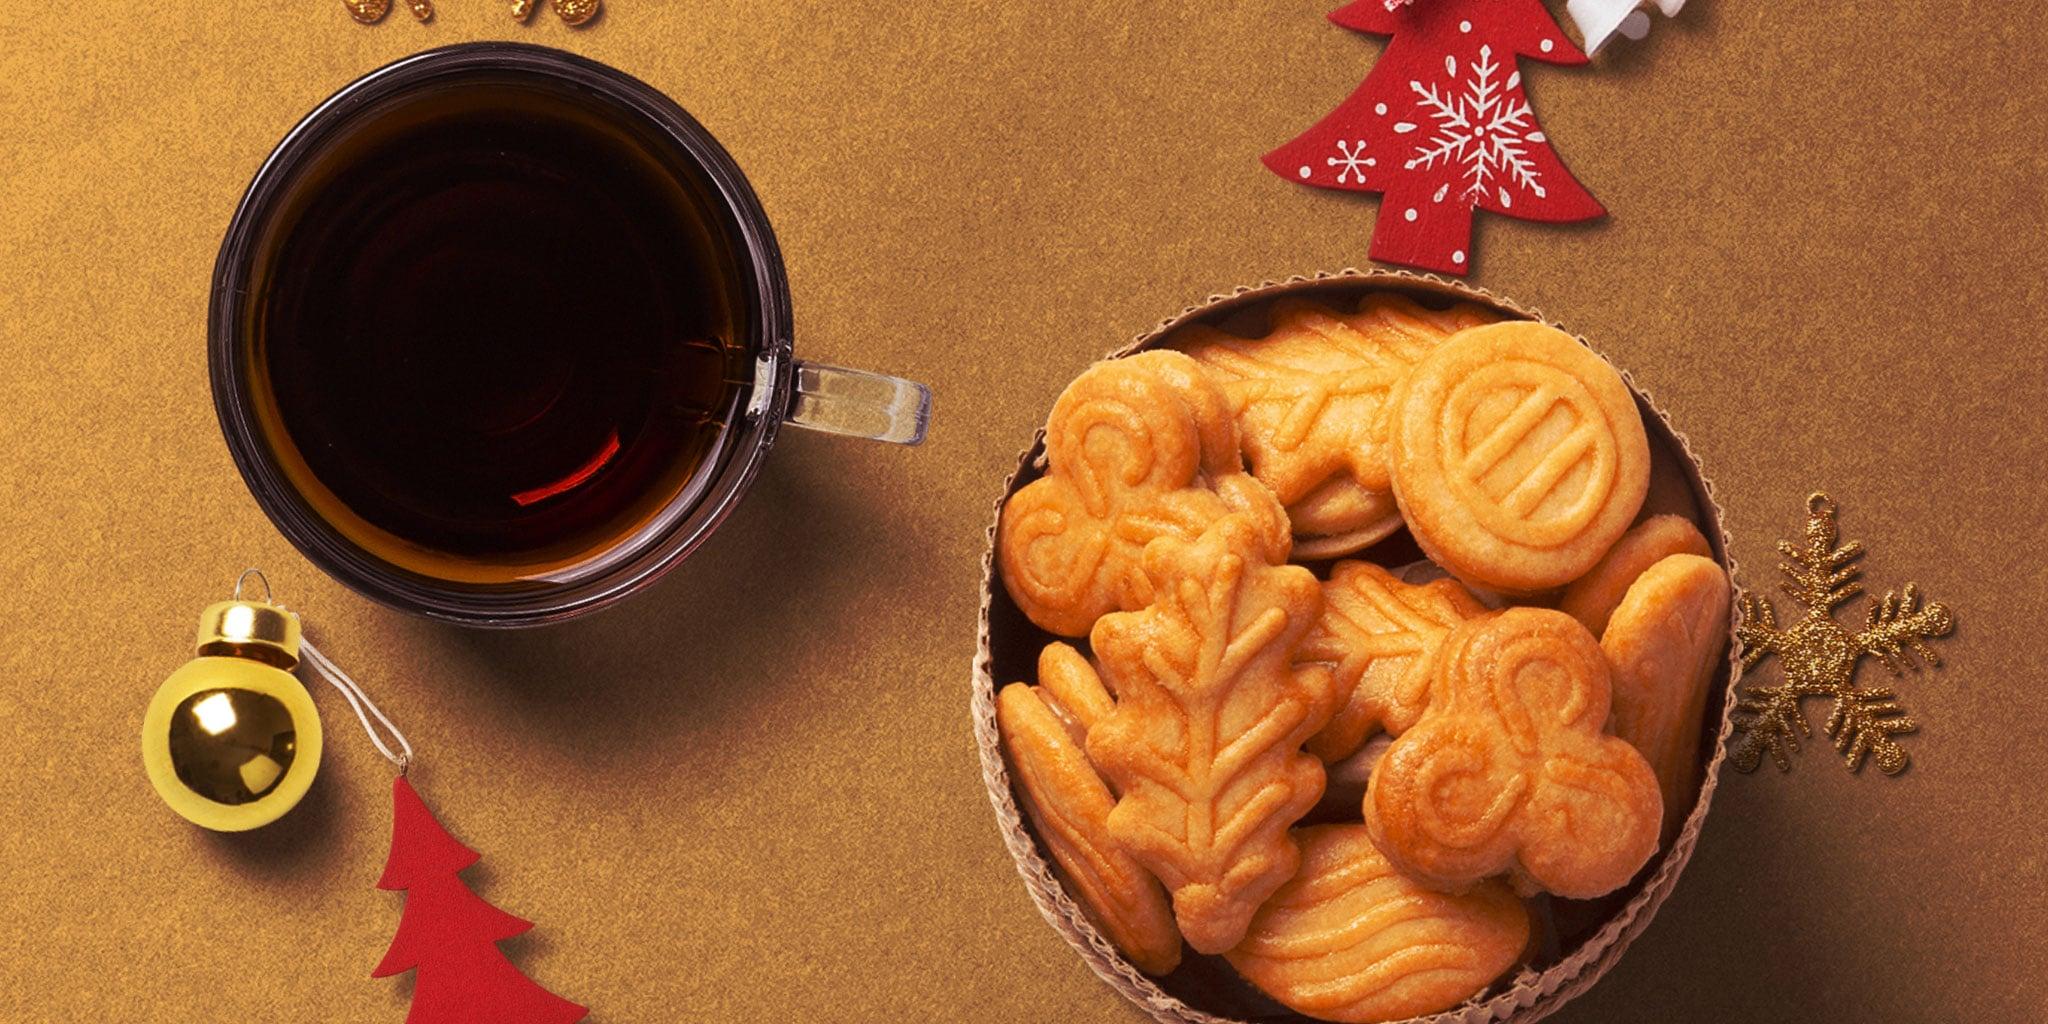 FokusPrettigeDagen-online-kerstkoeken en een kopje thee